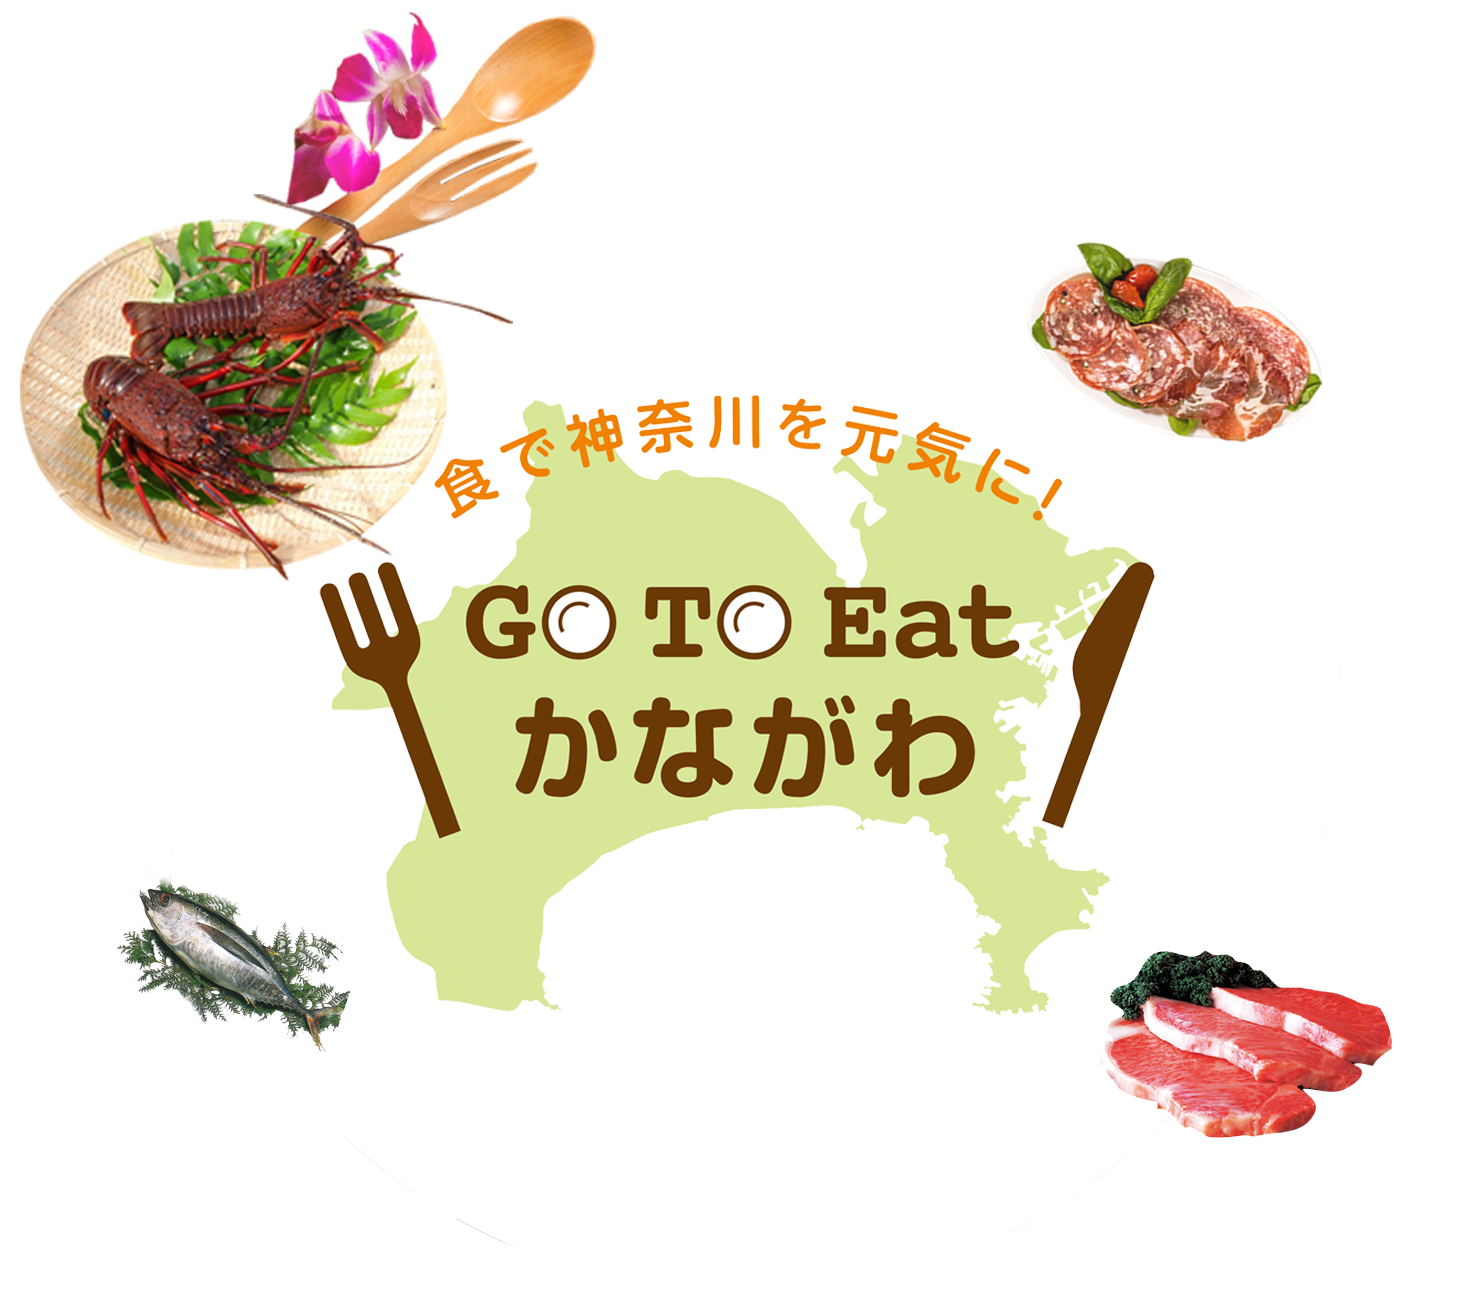 GO TO イート神奈川イラスト